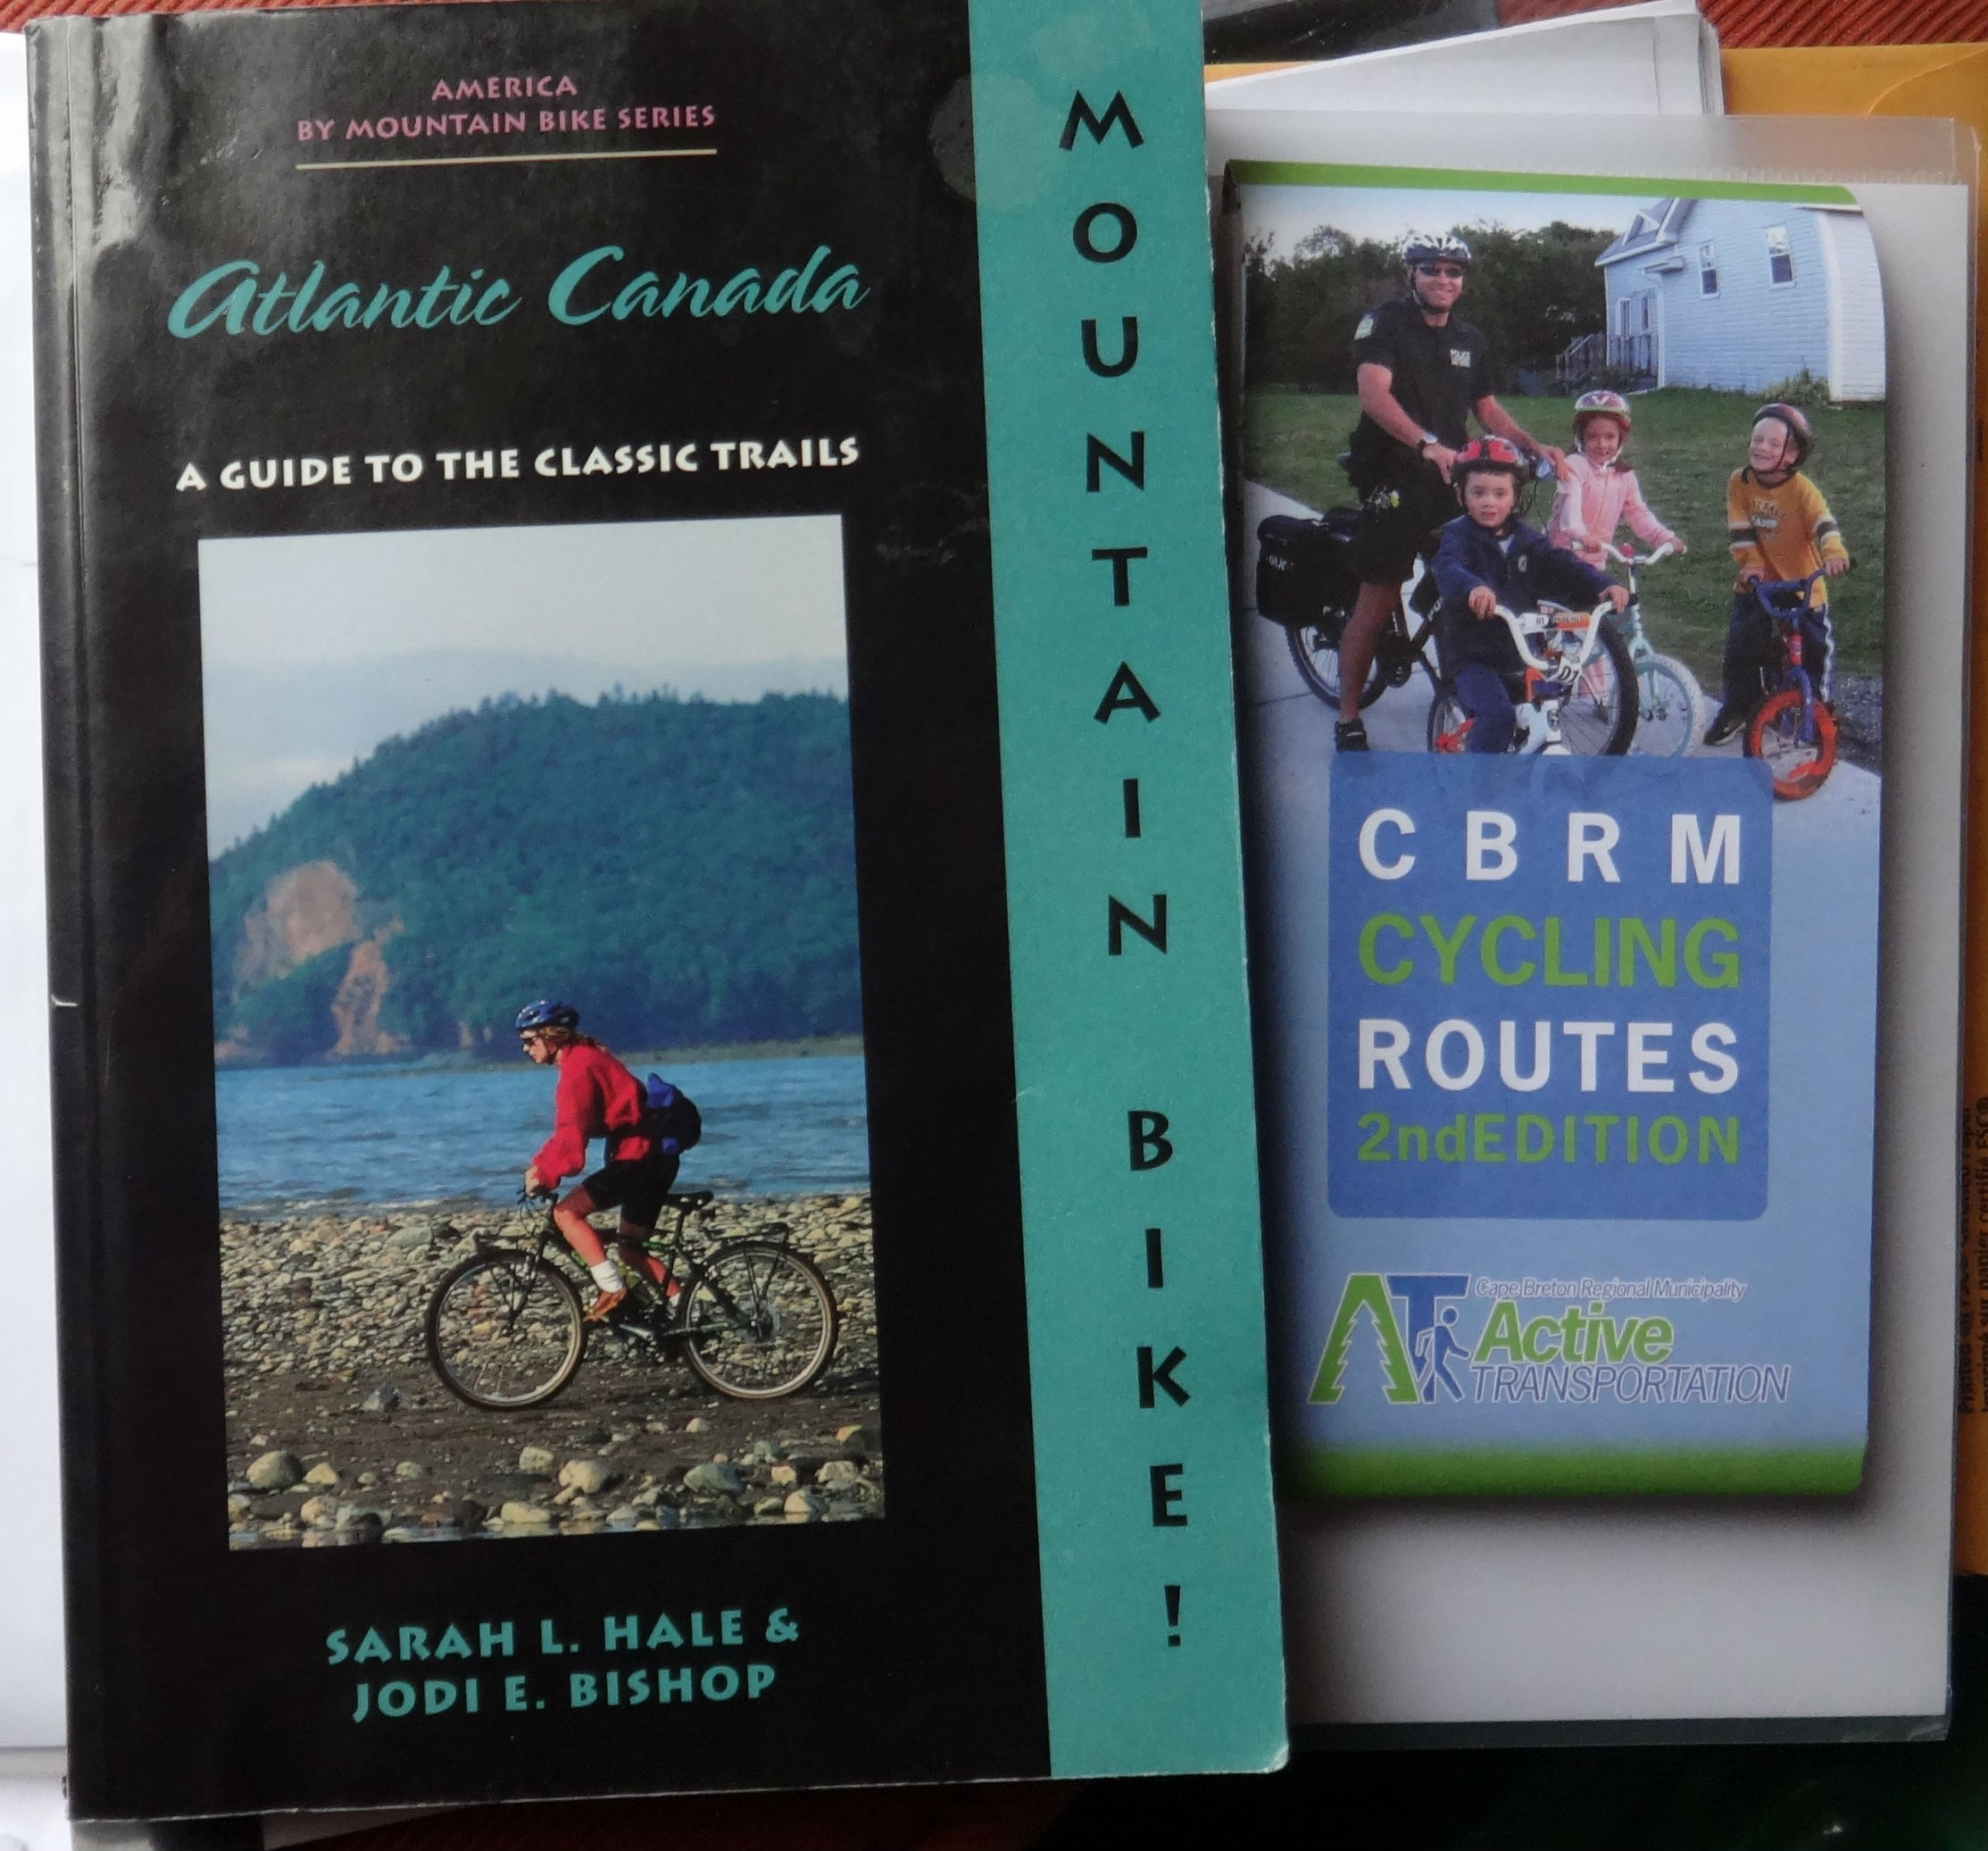 Cycling trails in Cape Breton | goCapeBreton com